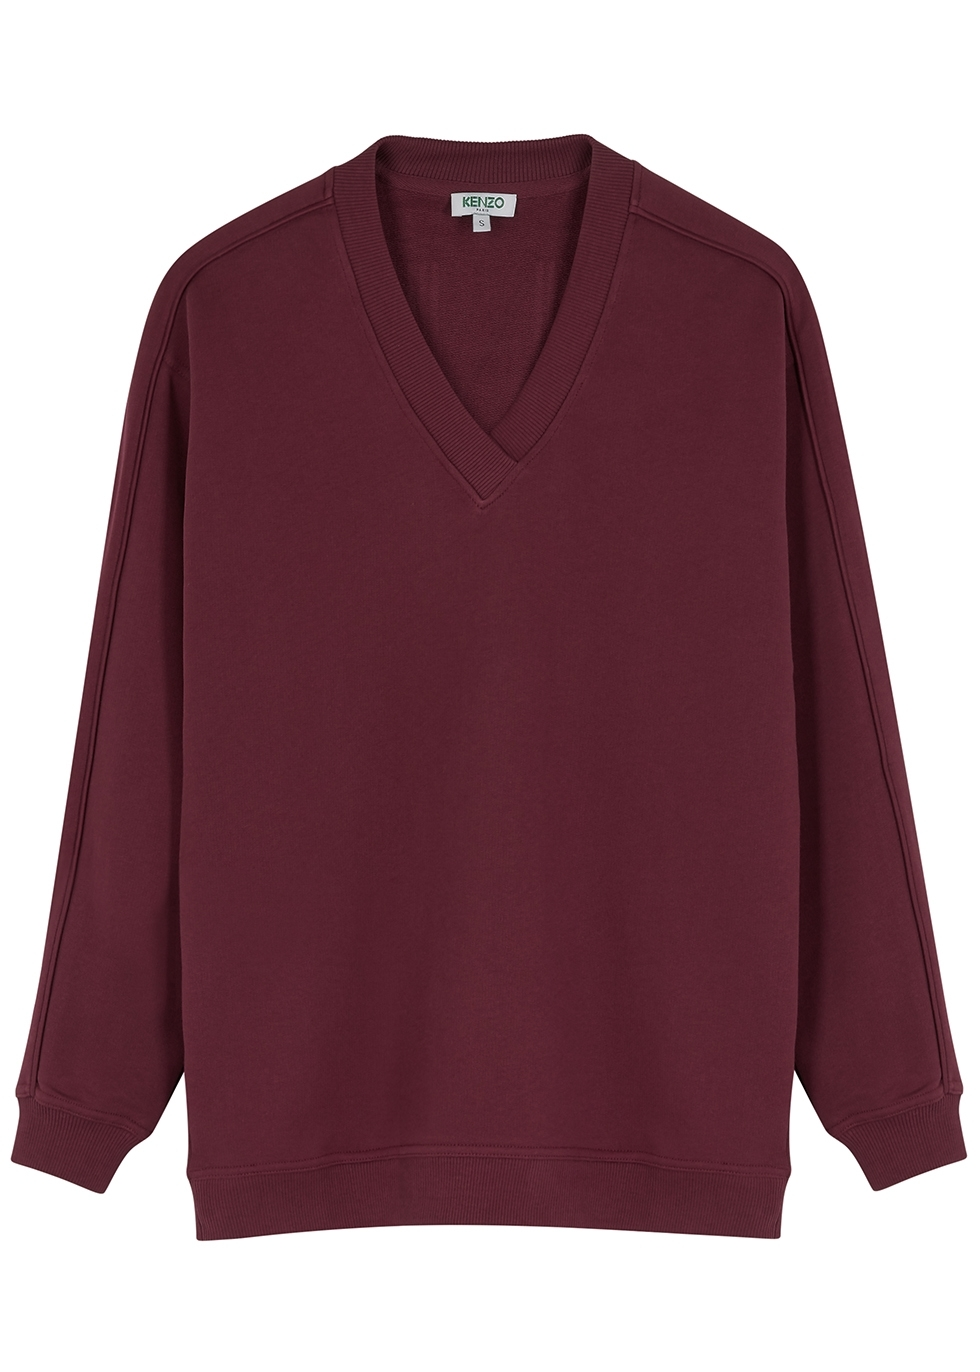 9646c761f Kenzo - Designer Sweatshirts, T-Shirts, Bags - Harvey Nichols